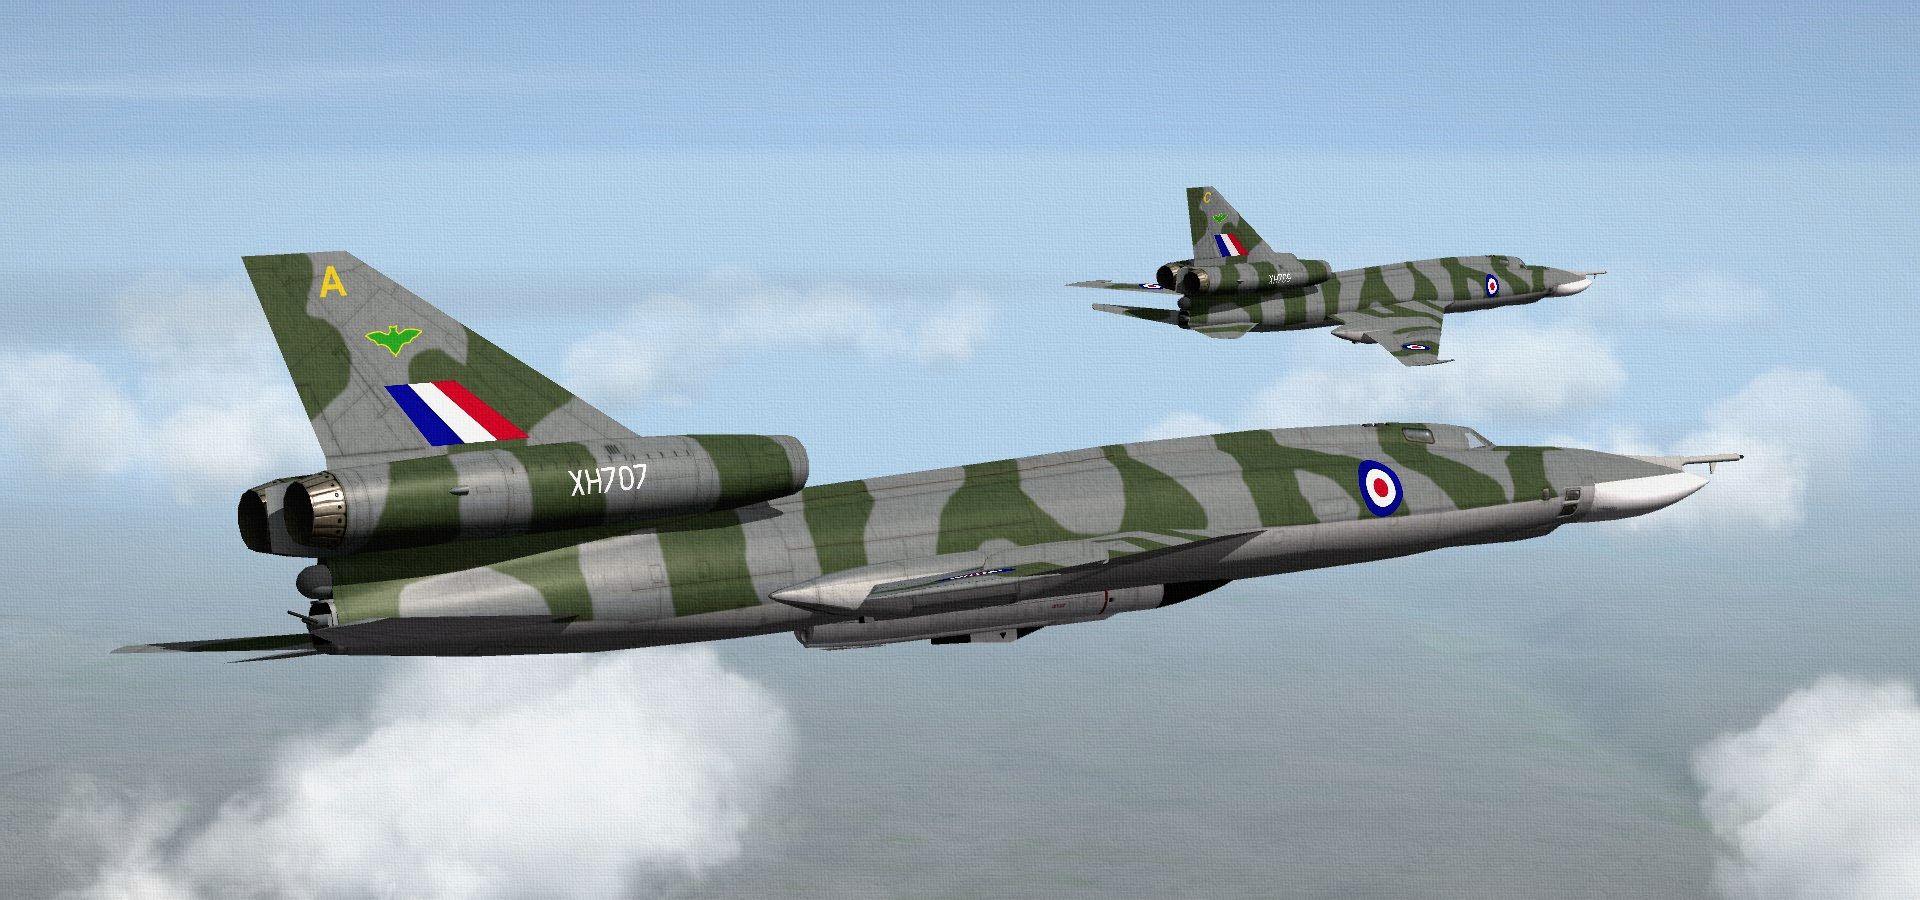 RAFTU-22KDBLINDER13_zps793a98d8.jpg